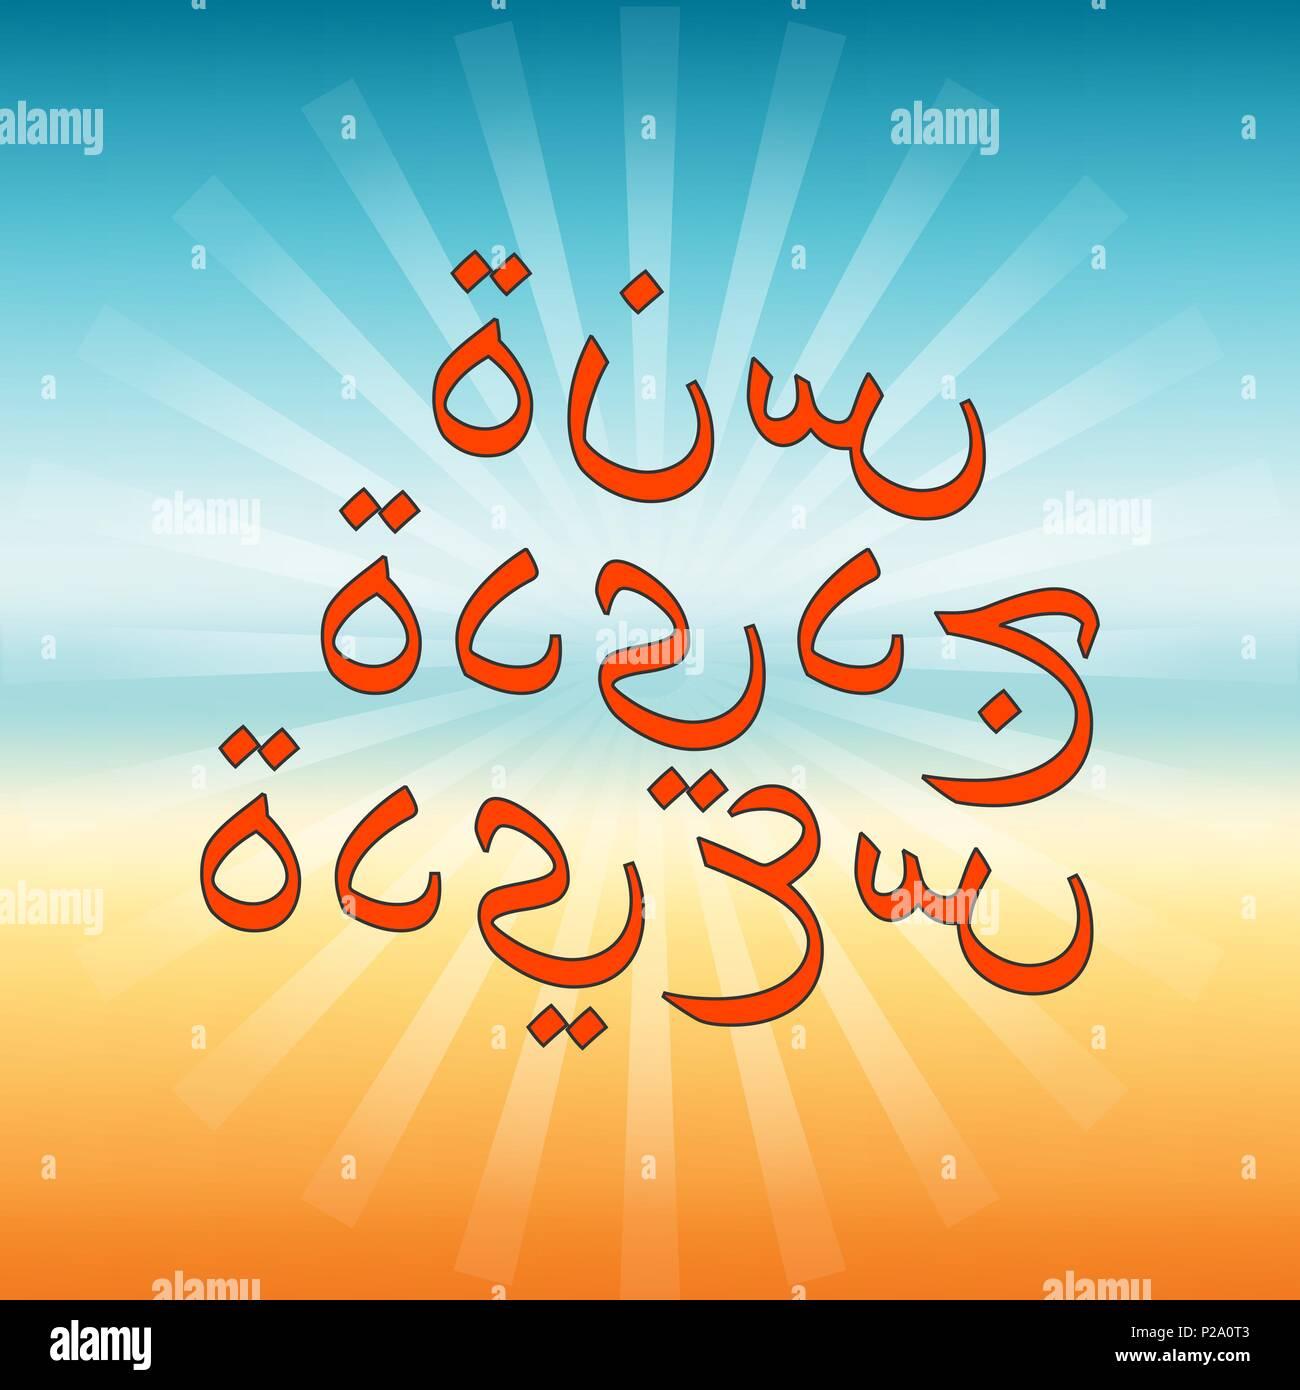 Happy new year in arabic language creative greeting card template happy new year in arabic language creative greeting card template over sunny background m4hsunfo